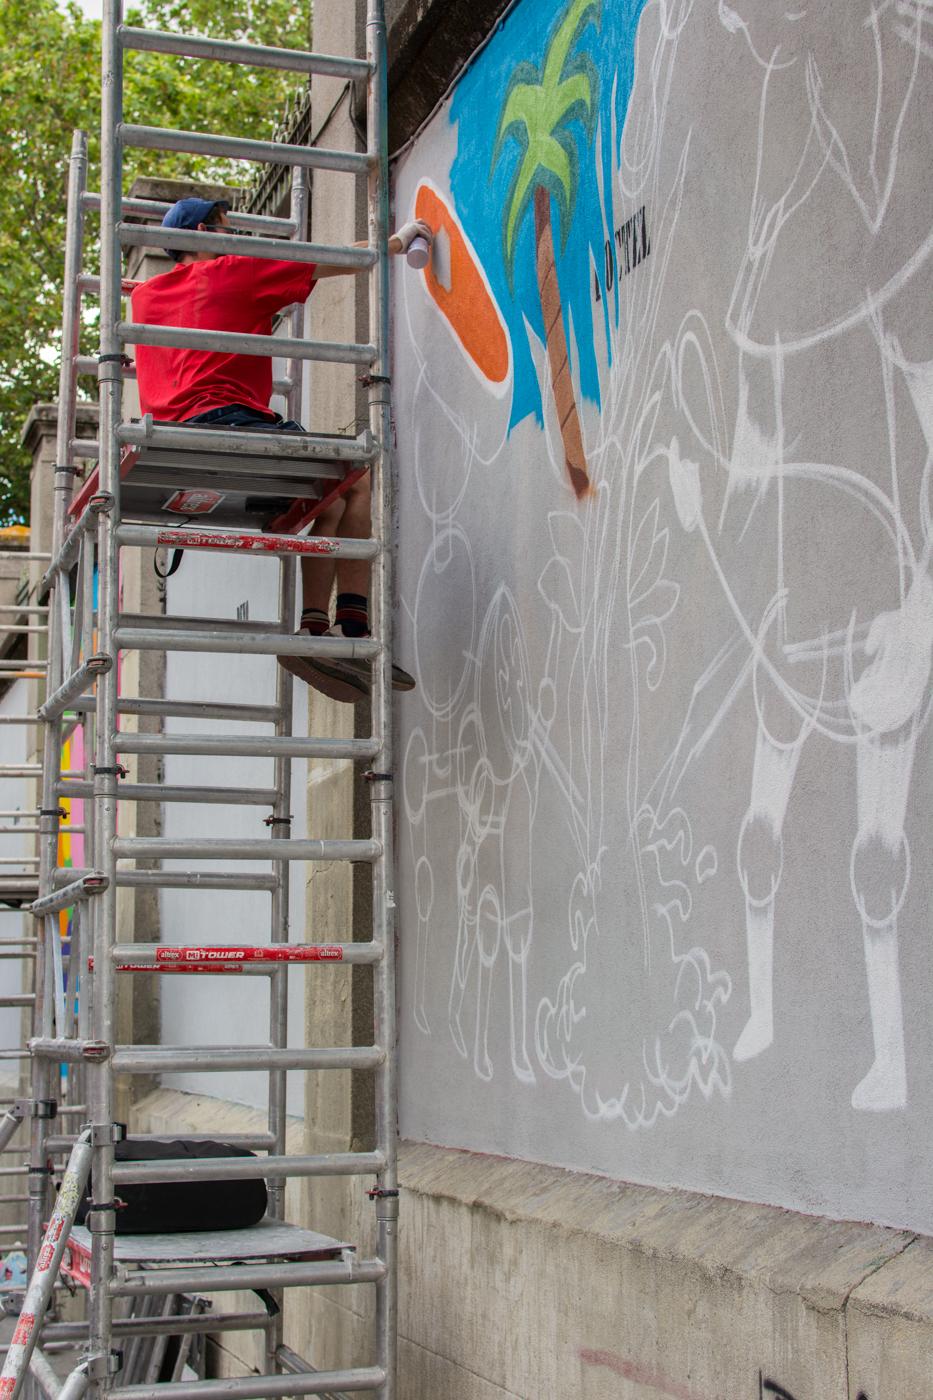 muros2016_martes-0274.jpg